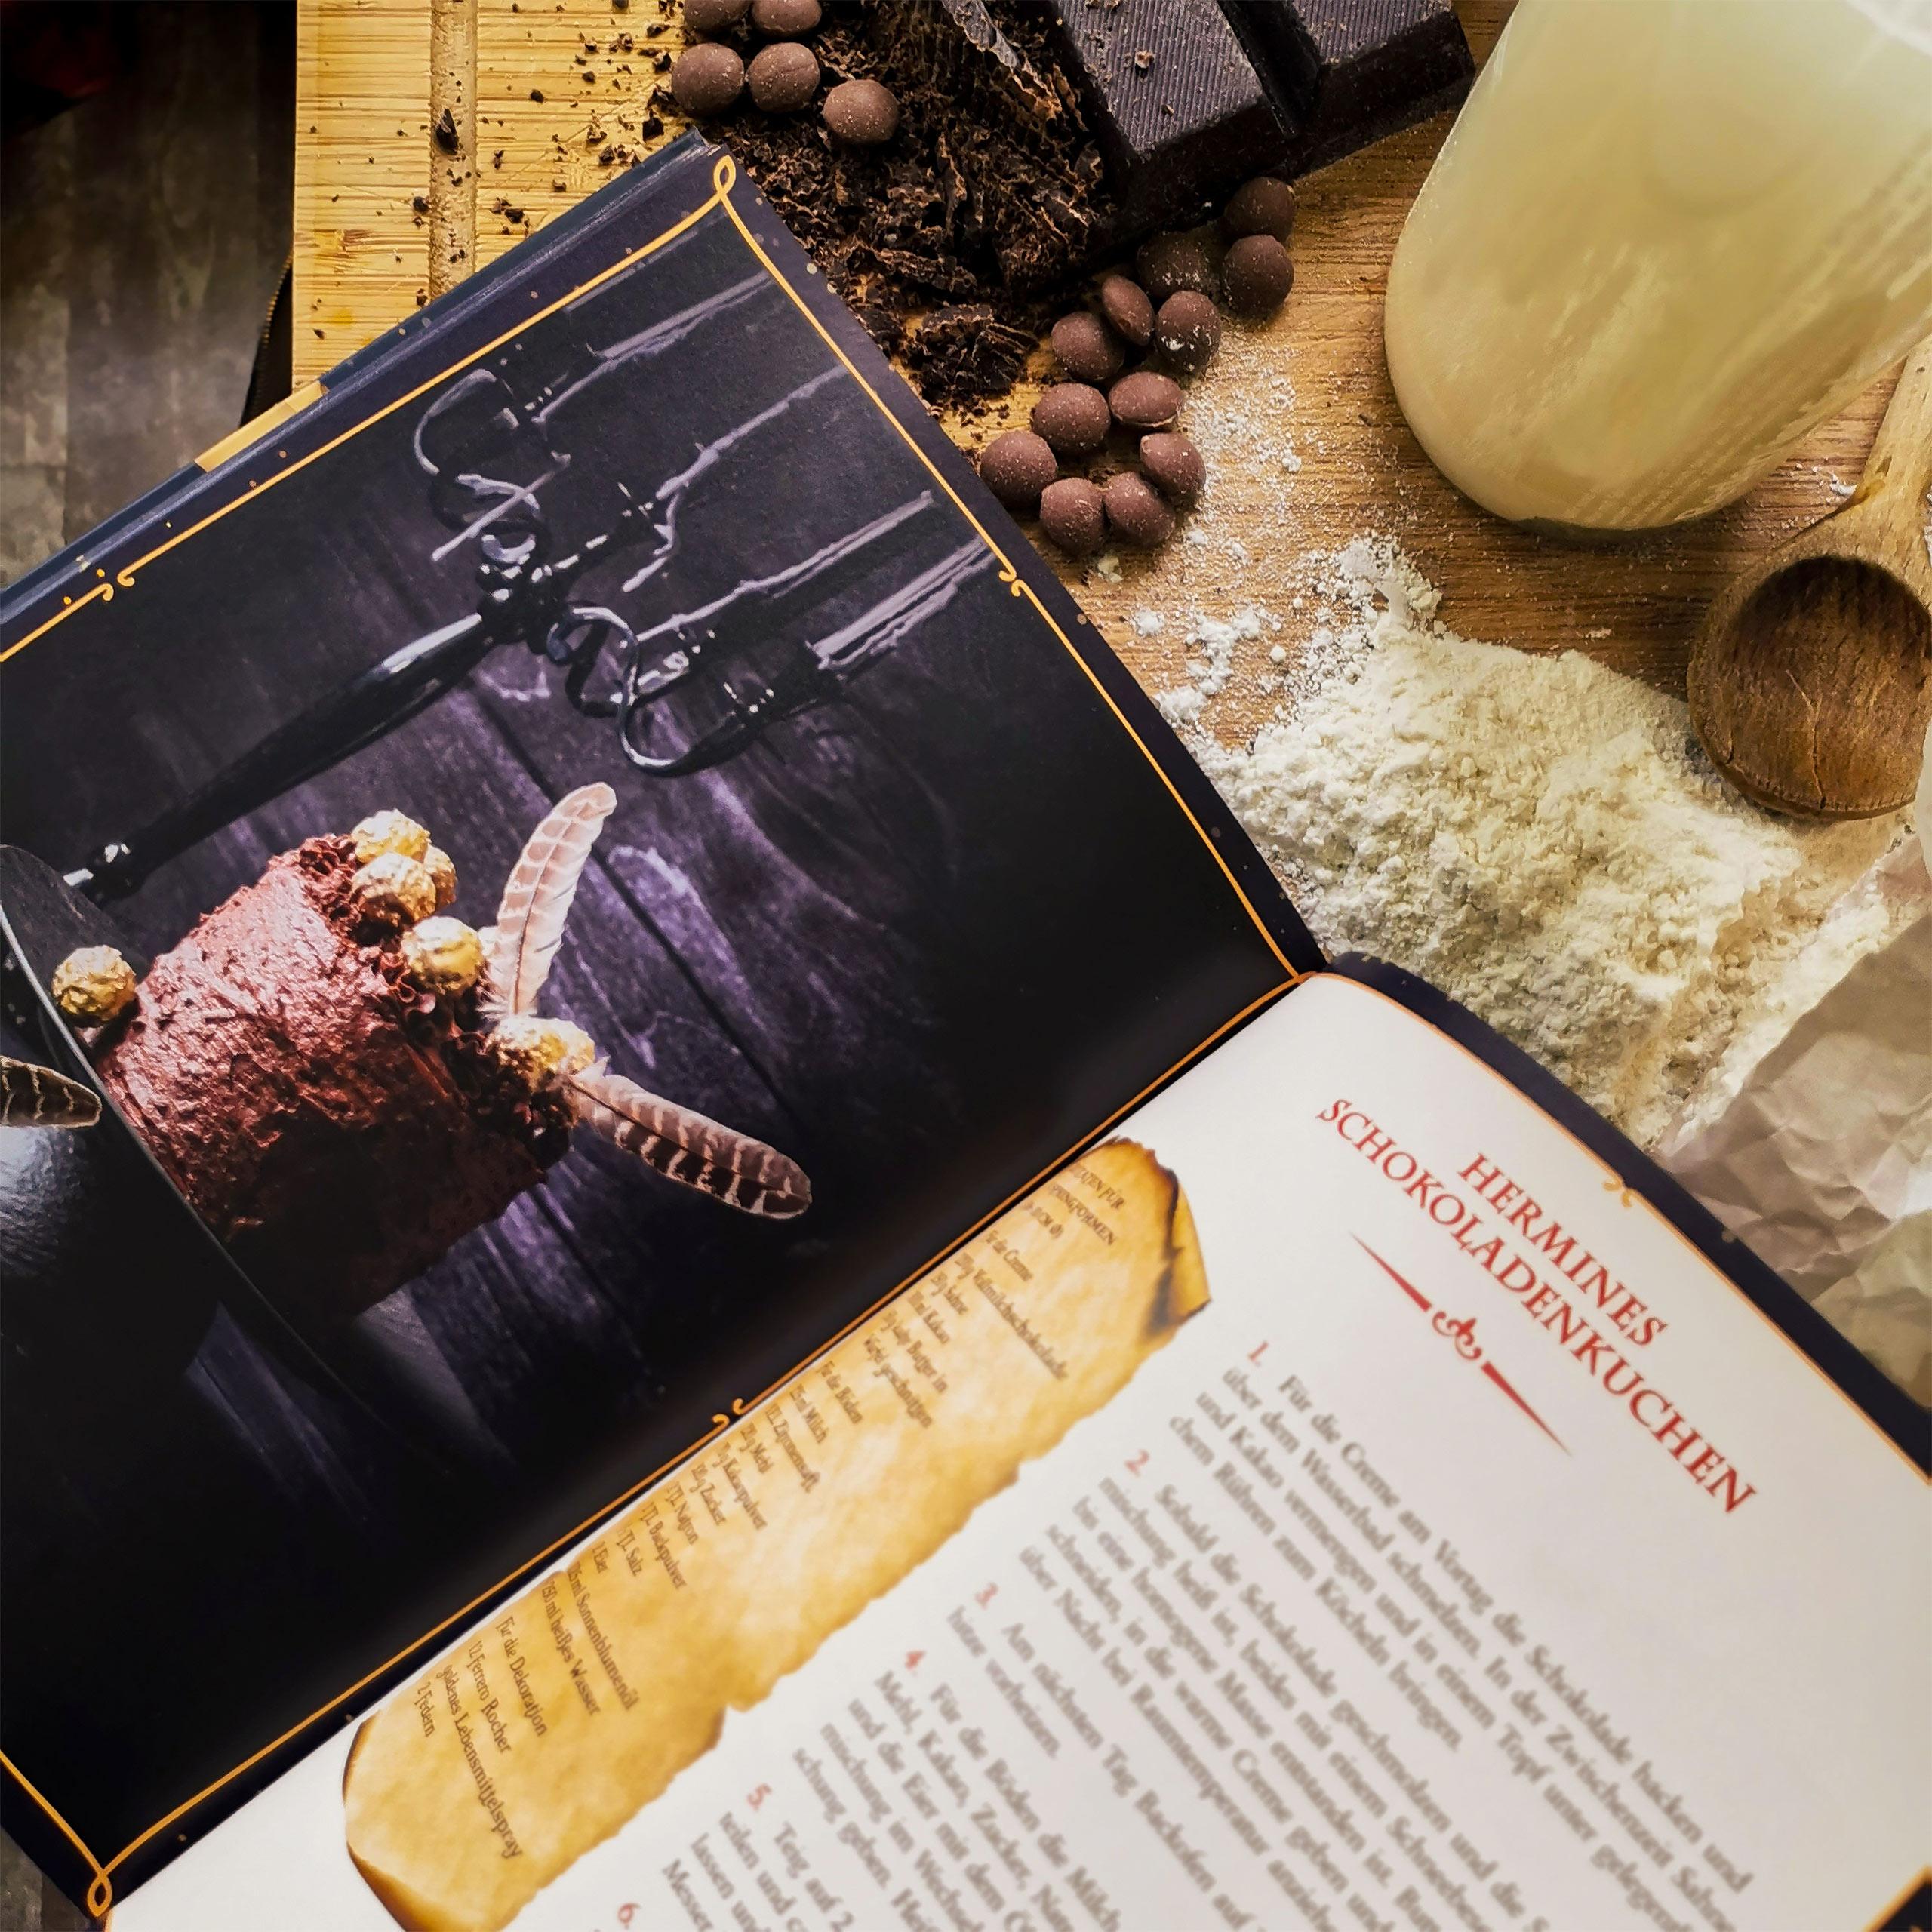 Das inoffizielle Harry Potter Koch- und Backbuch